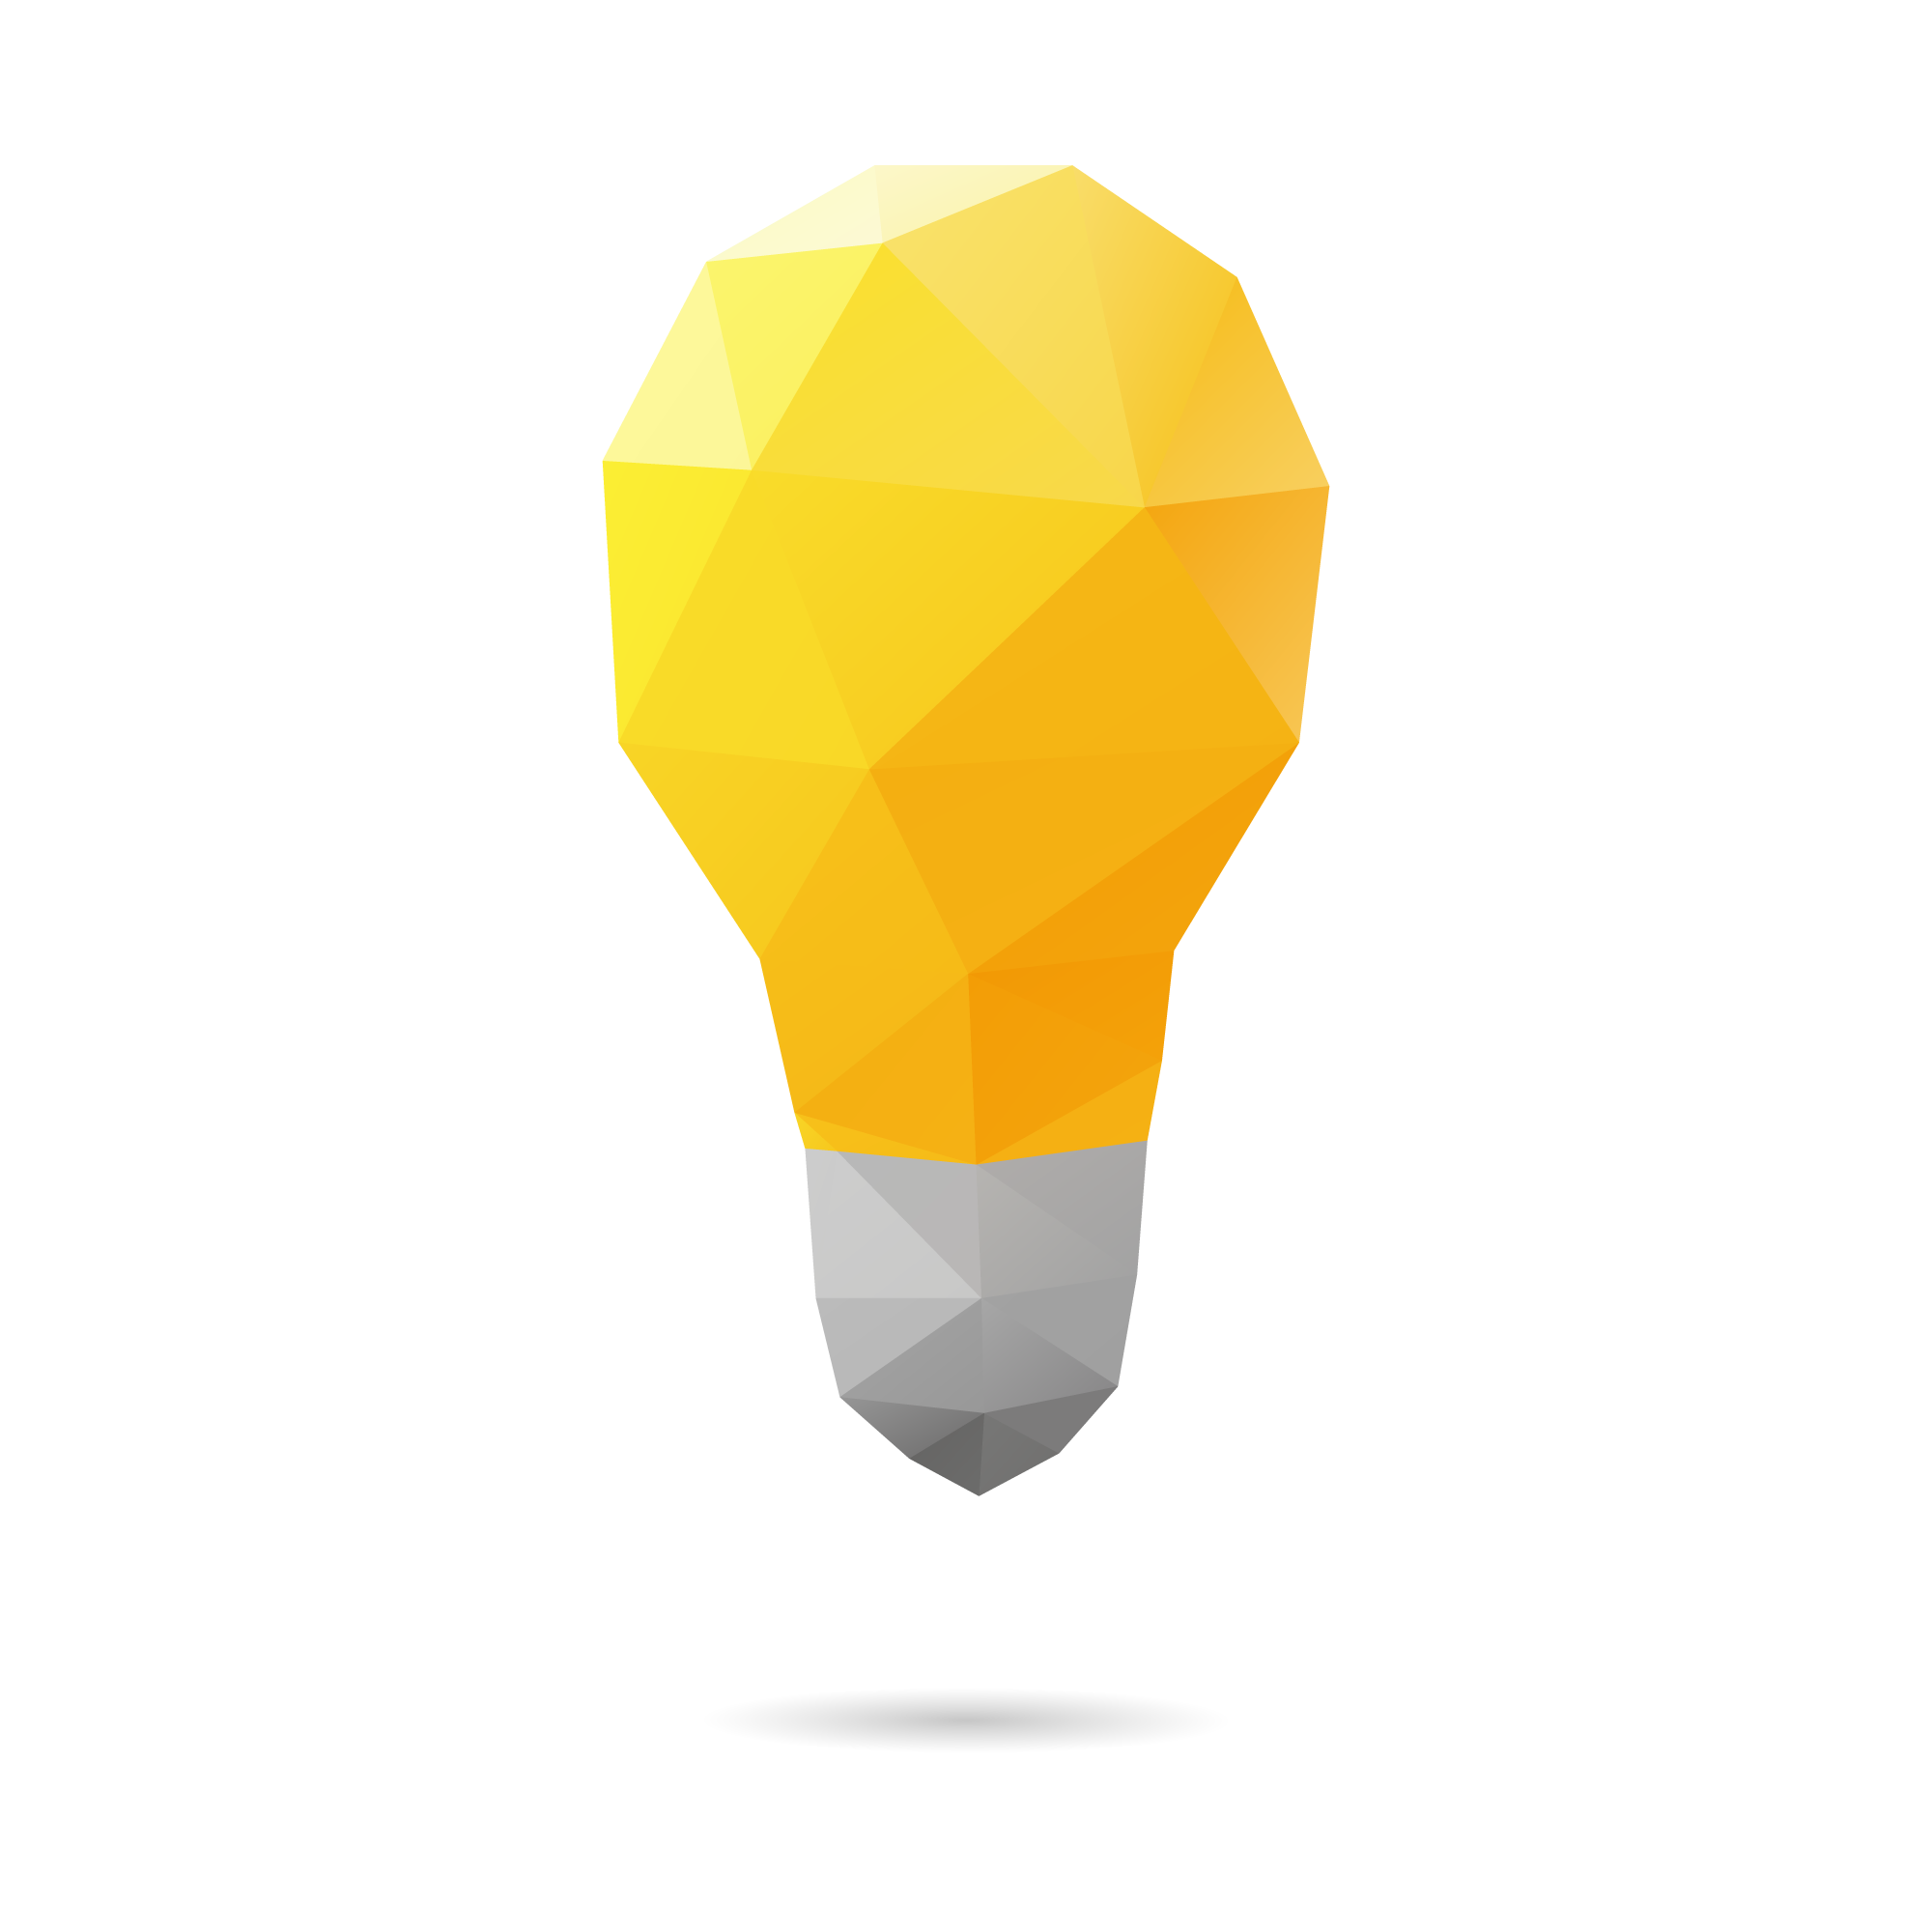 IoT_H_2000x2000_Artboard 4Yellow_Lightbulb.png